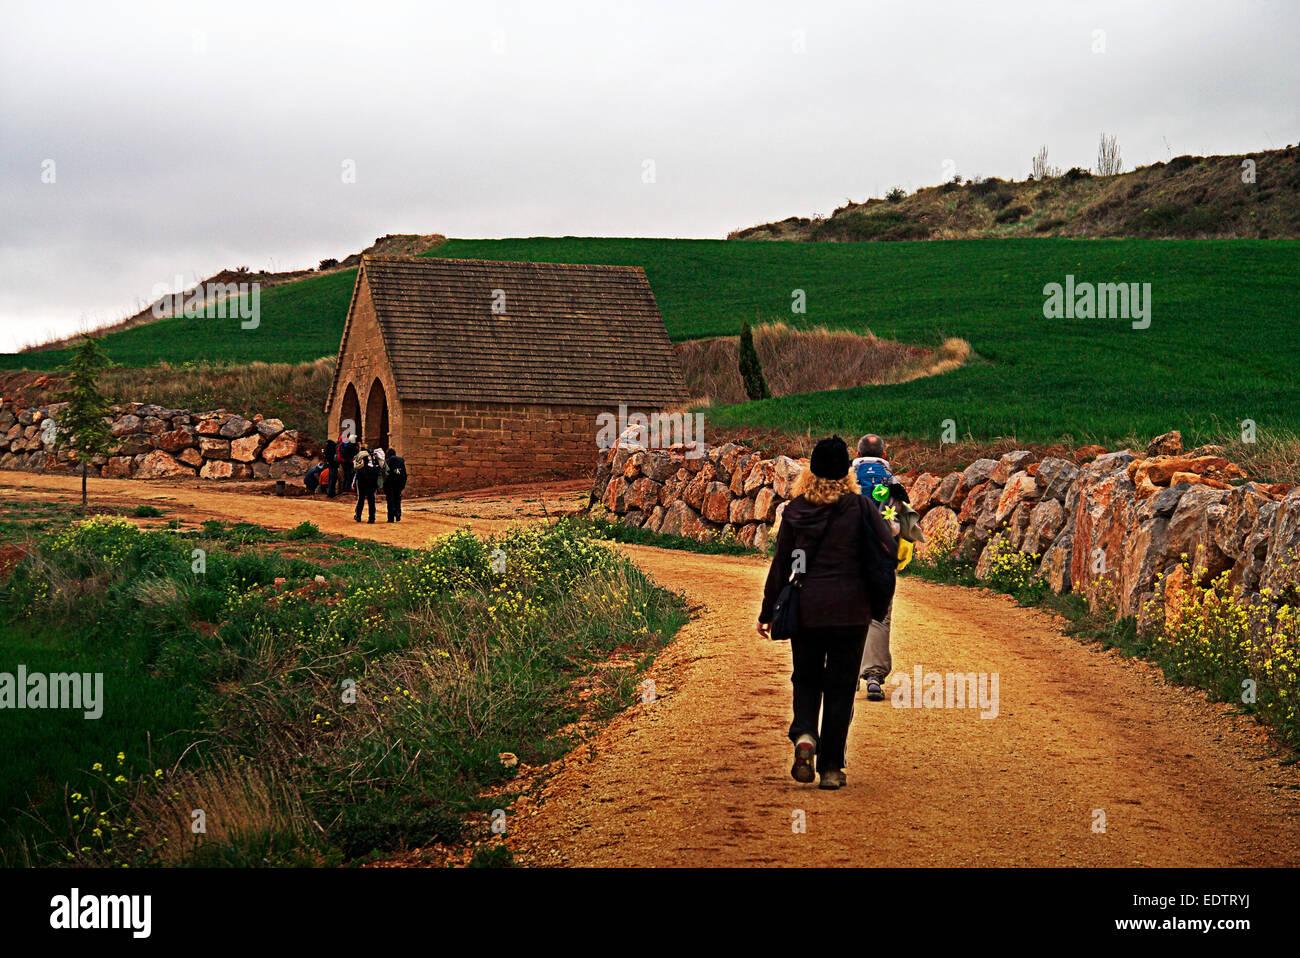 Pilgrims walking on the Camino de Santiago de Compostela. Way of Saint James pilgrimage - Stock Image